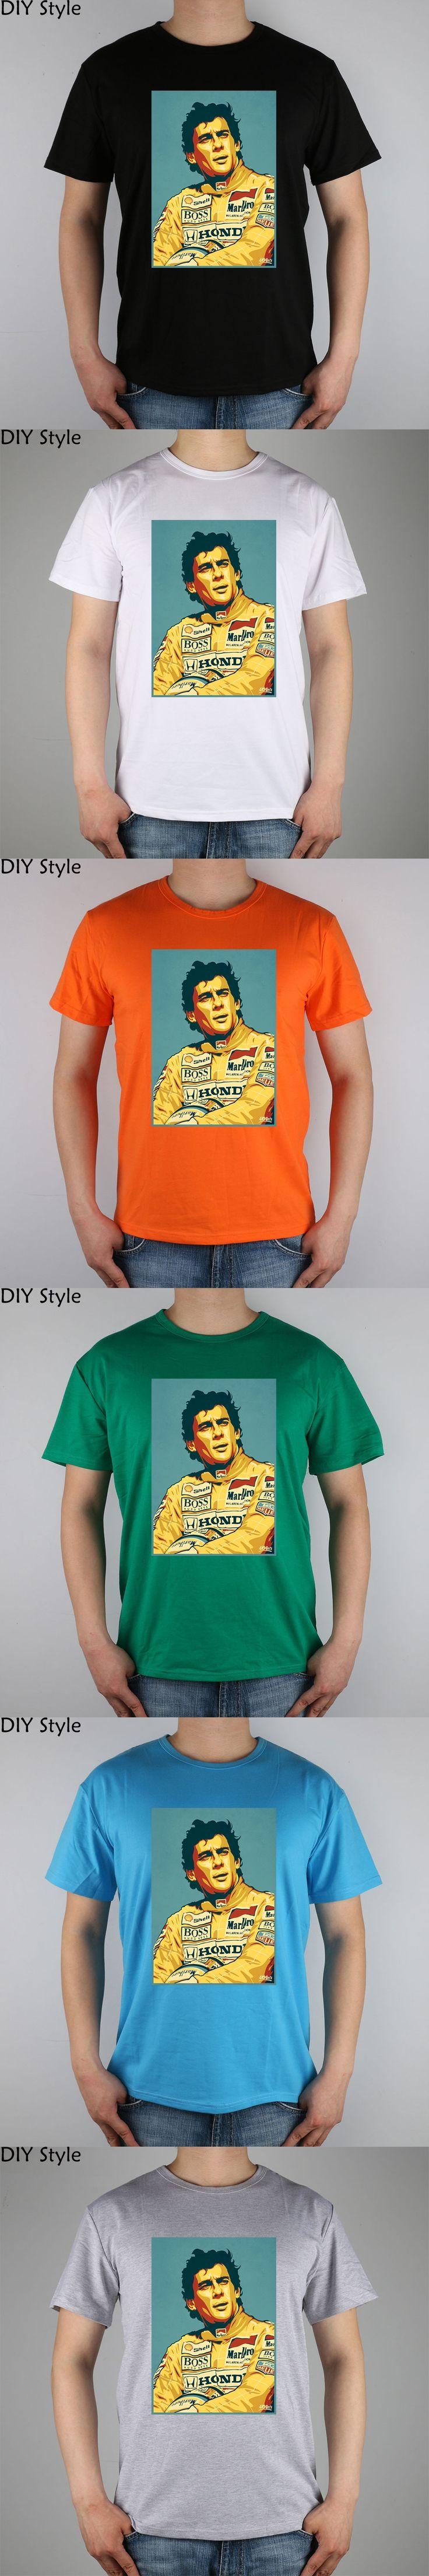 Ayrton Senna Tribute Piece t-shirt Top Lycra Cotton Men T Shirt New Diy Style